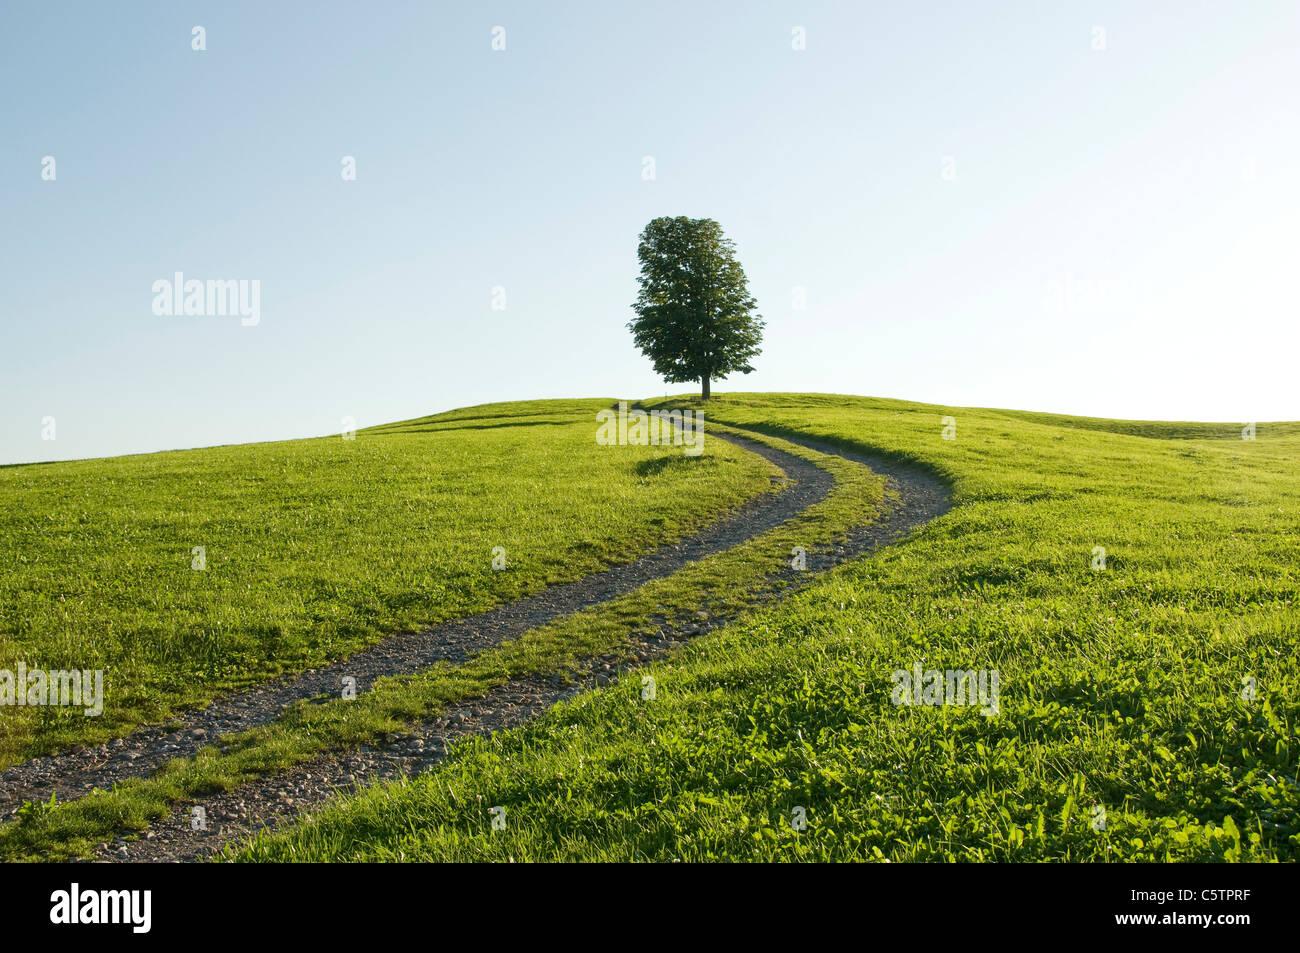 Deutschland, Bayern, Allgäu, einziger Baum neben Feldweg Stockbild